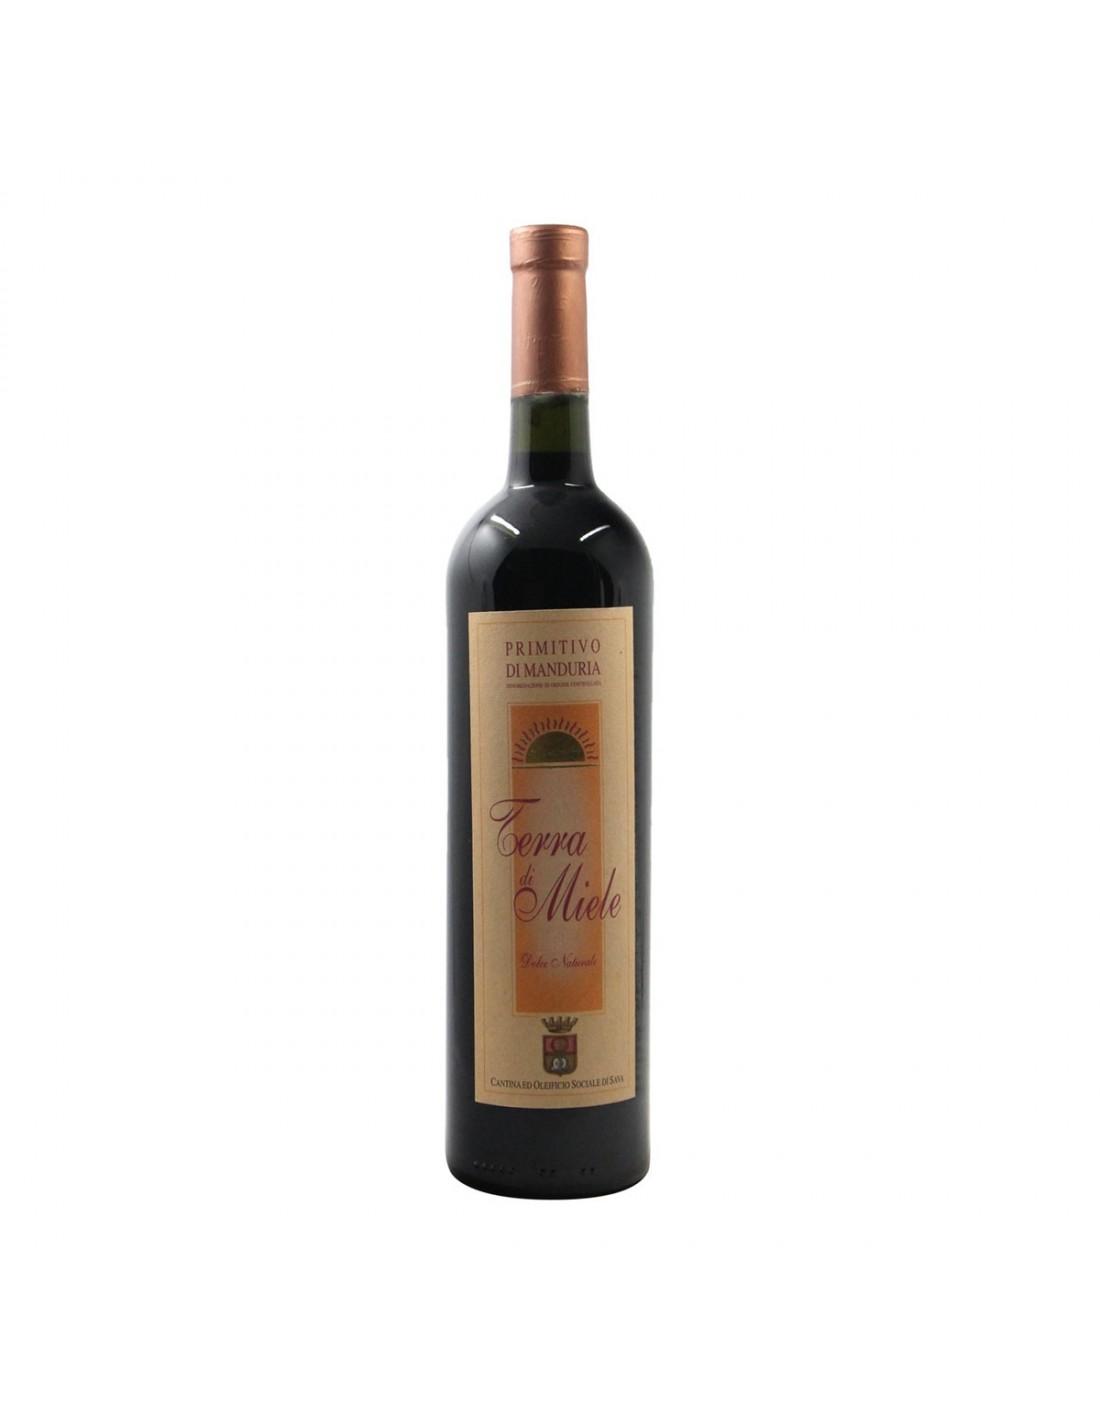 PRIMITIVO DOLCE DI MANDURIA 1996 CANTINA SOCIALE DI SAVA Grandi Bottiglie